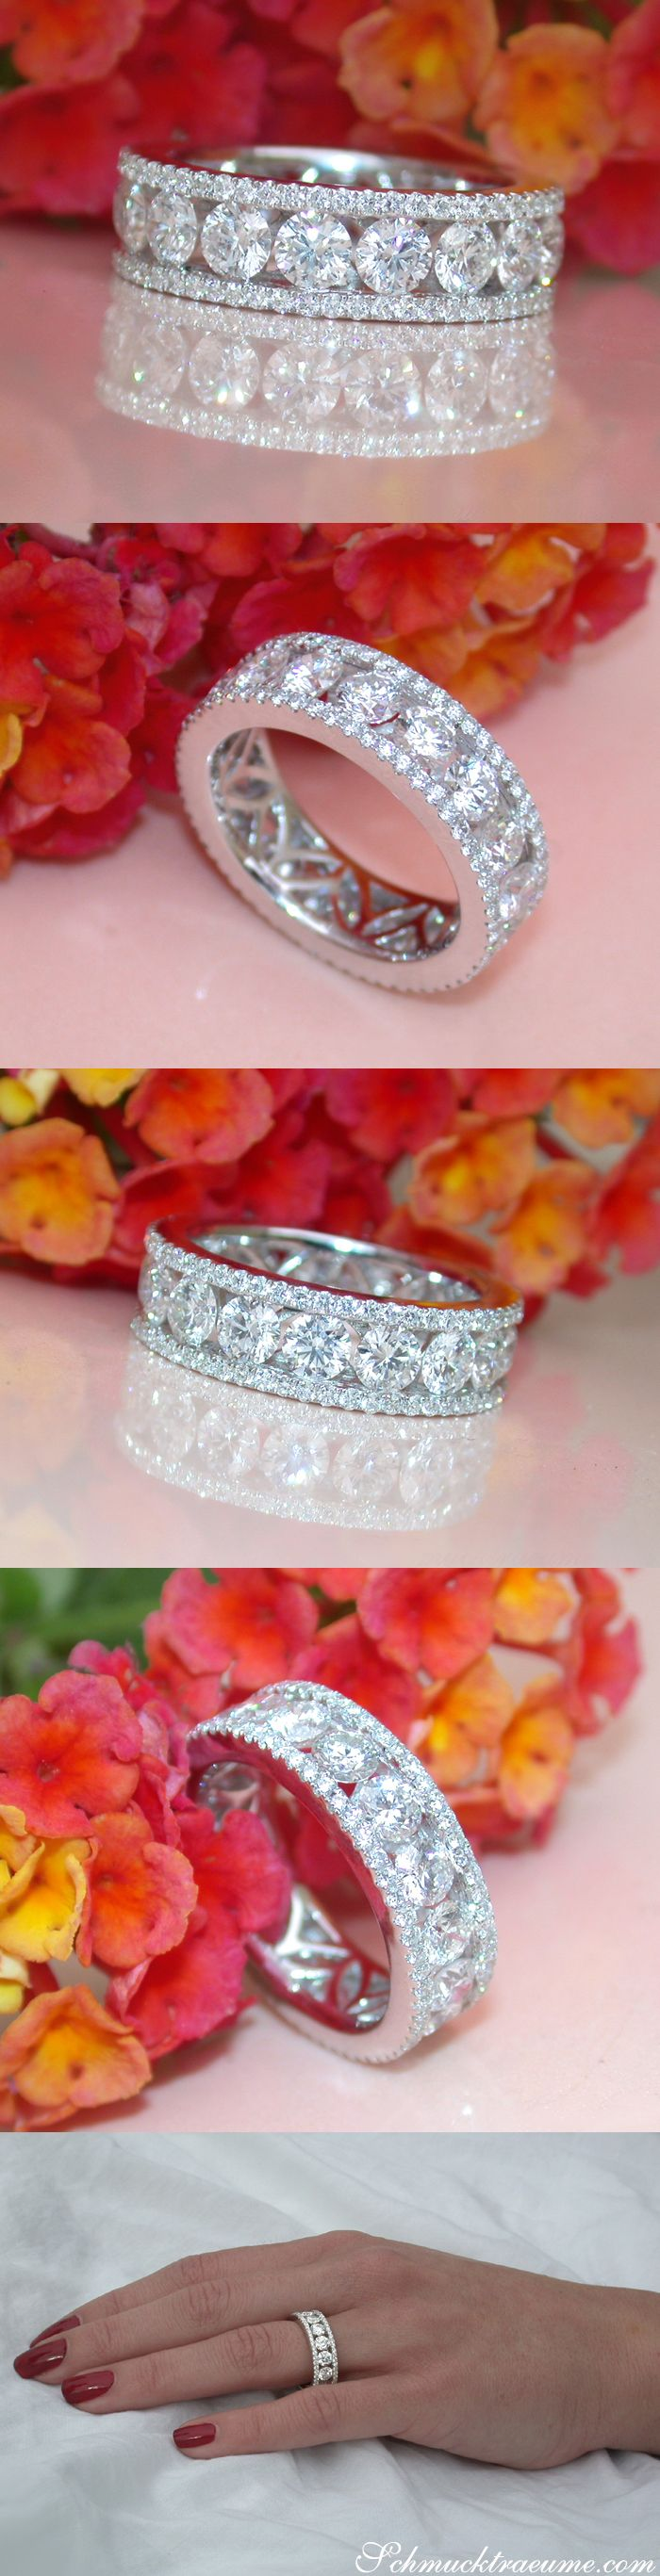 Precious Jewel: High Carat Diamond Eternity Ring, set with single 20-pointers | Edles Juwel: Hochkarätiger Brillanten Memory Ring | total: 4.18 ct. G VS | Whitegold 18k | Visit: schmucktraeume.com | Like: https://www.facebook.com/Noble-Juwelen-150871984924926/